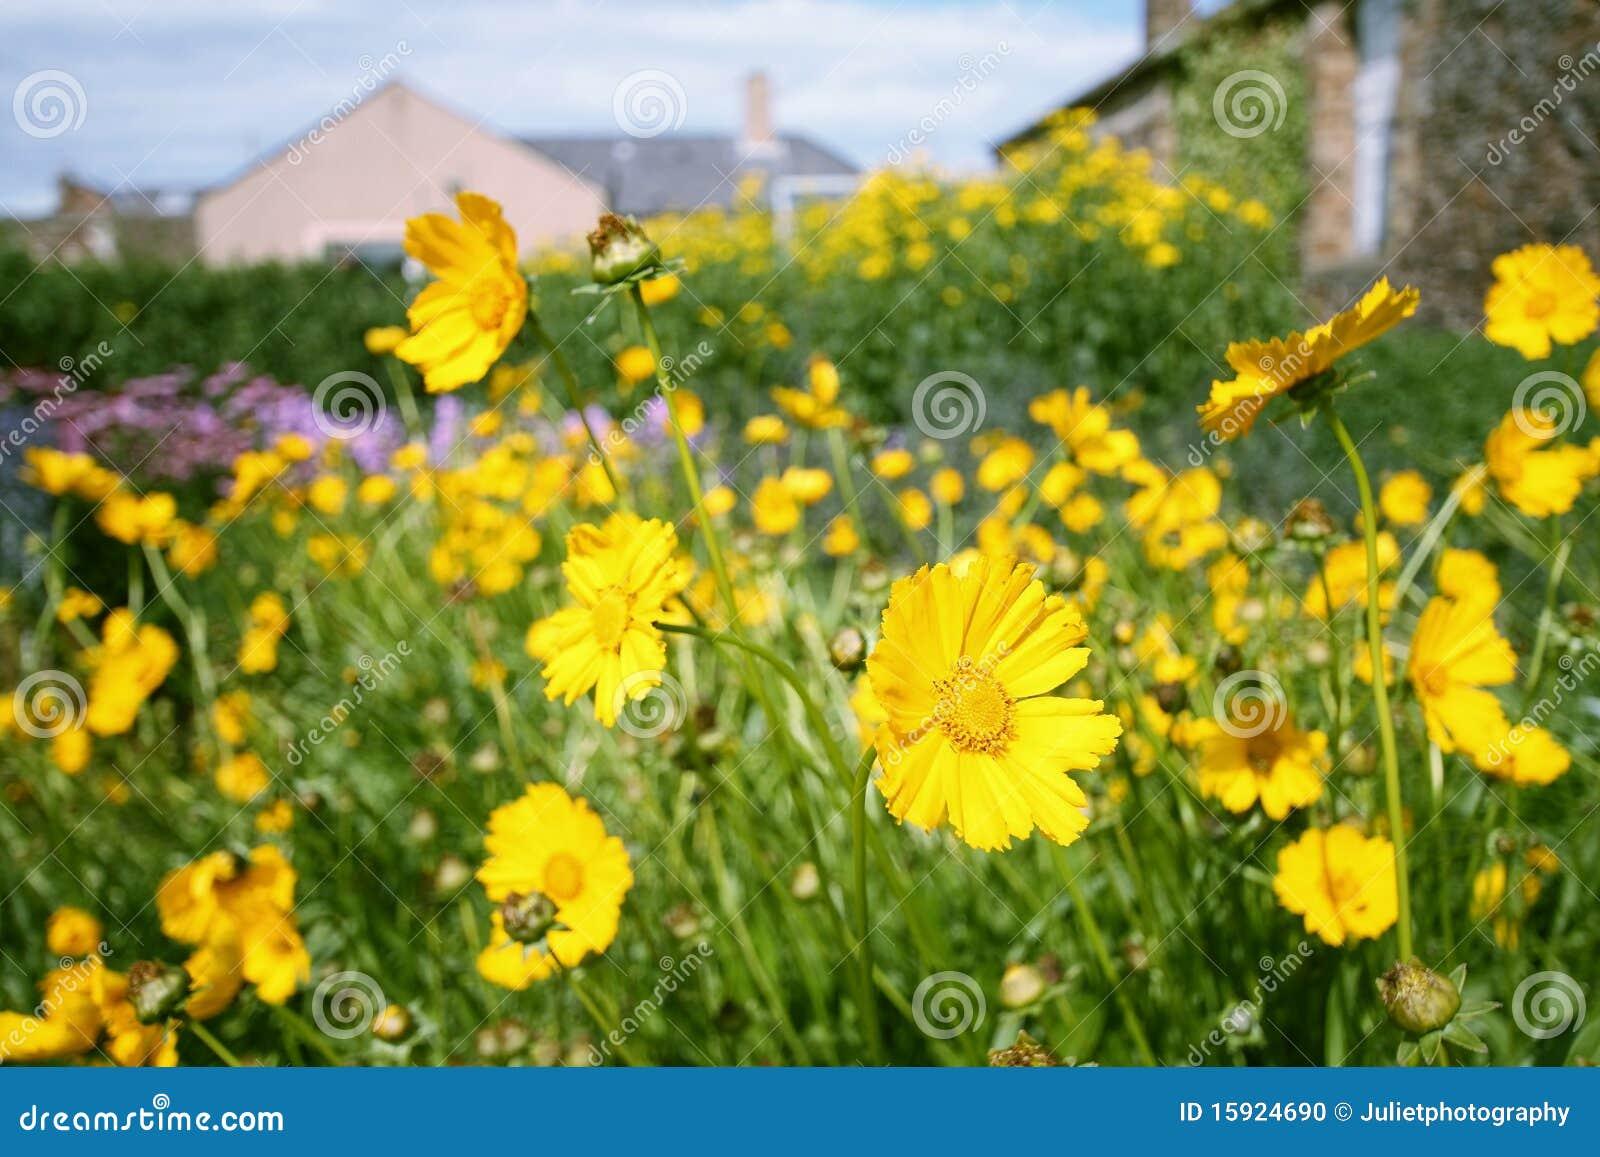 Yellow Garden Flowers Stock Photo Image 15924690